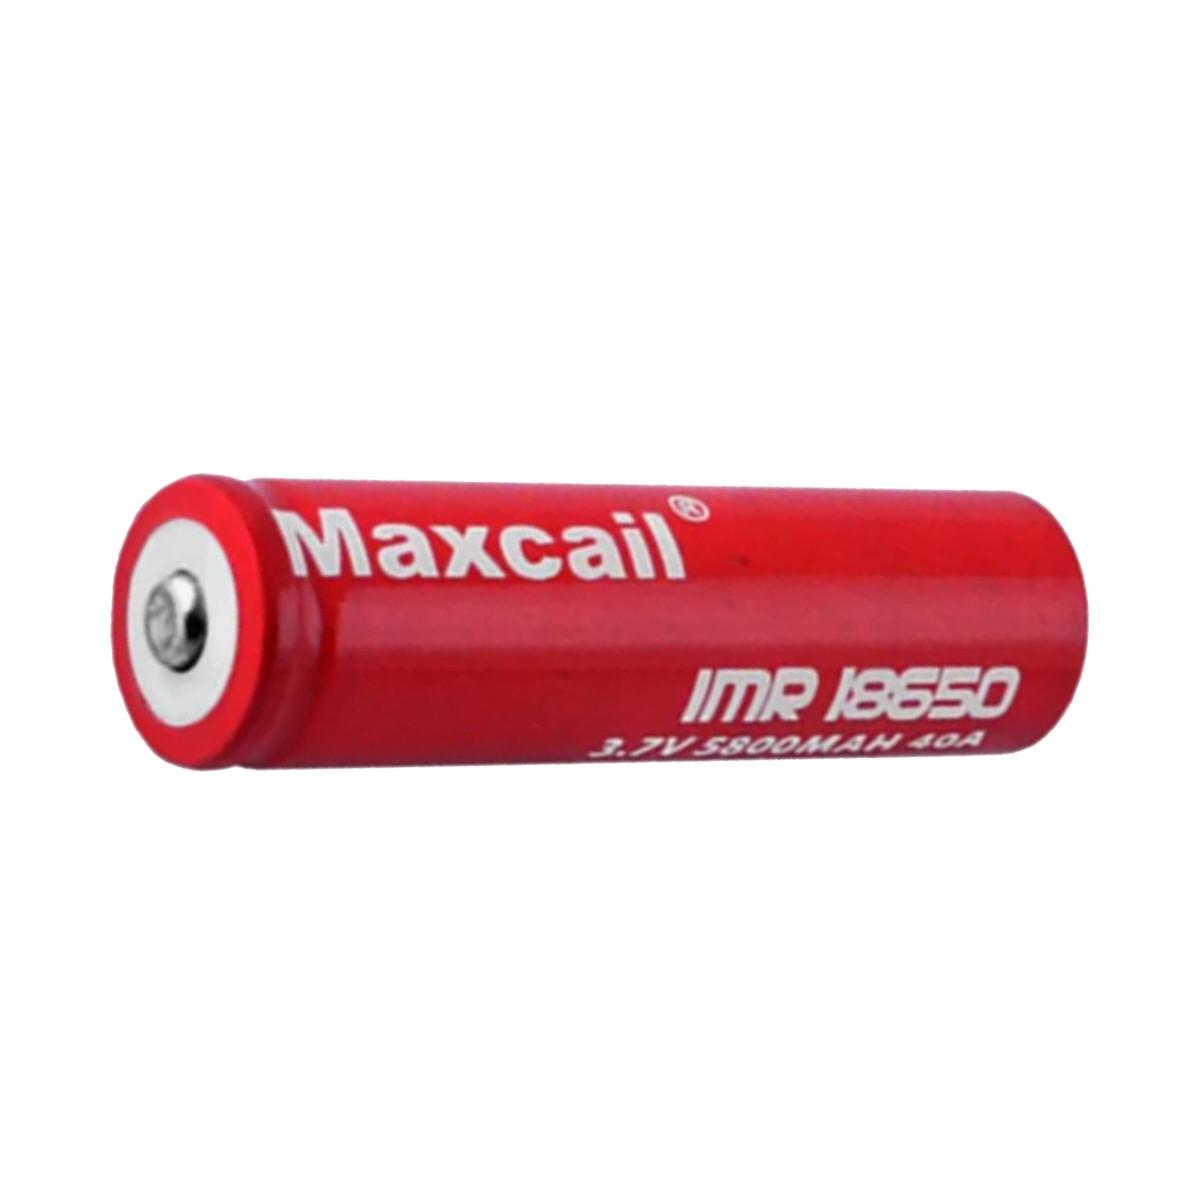 MAXCAIL - 18650 BATTERY